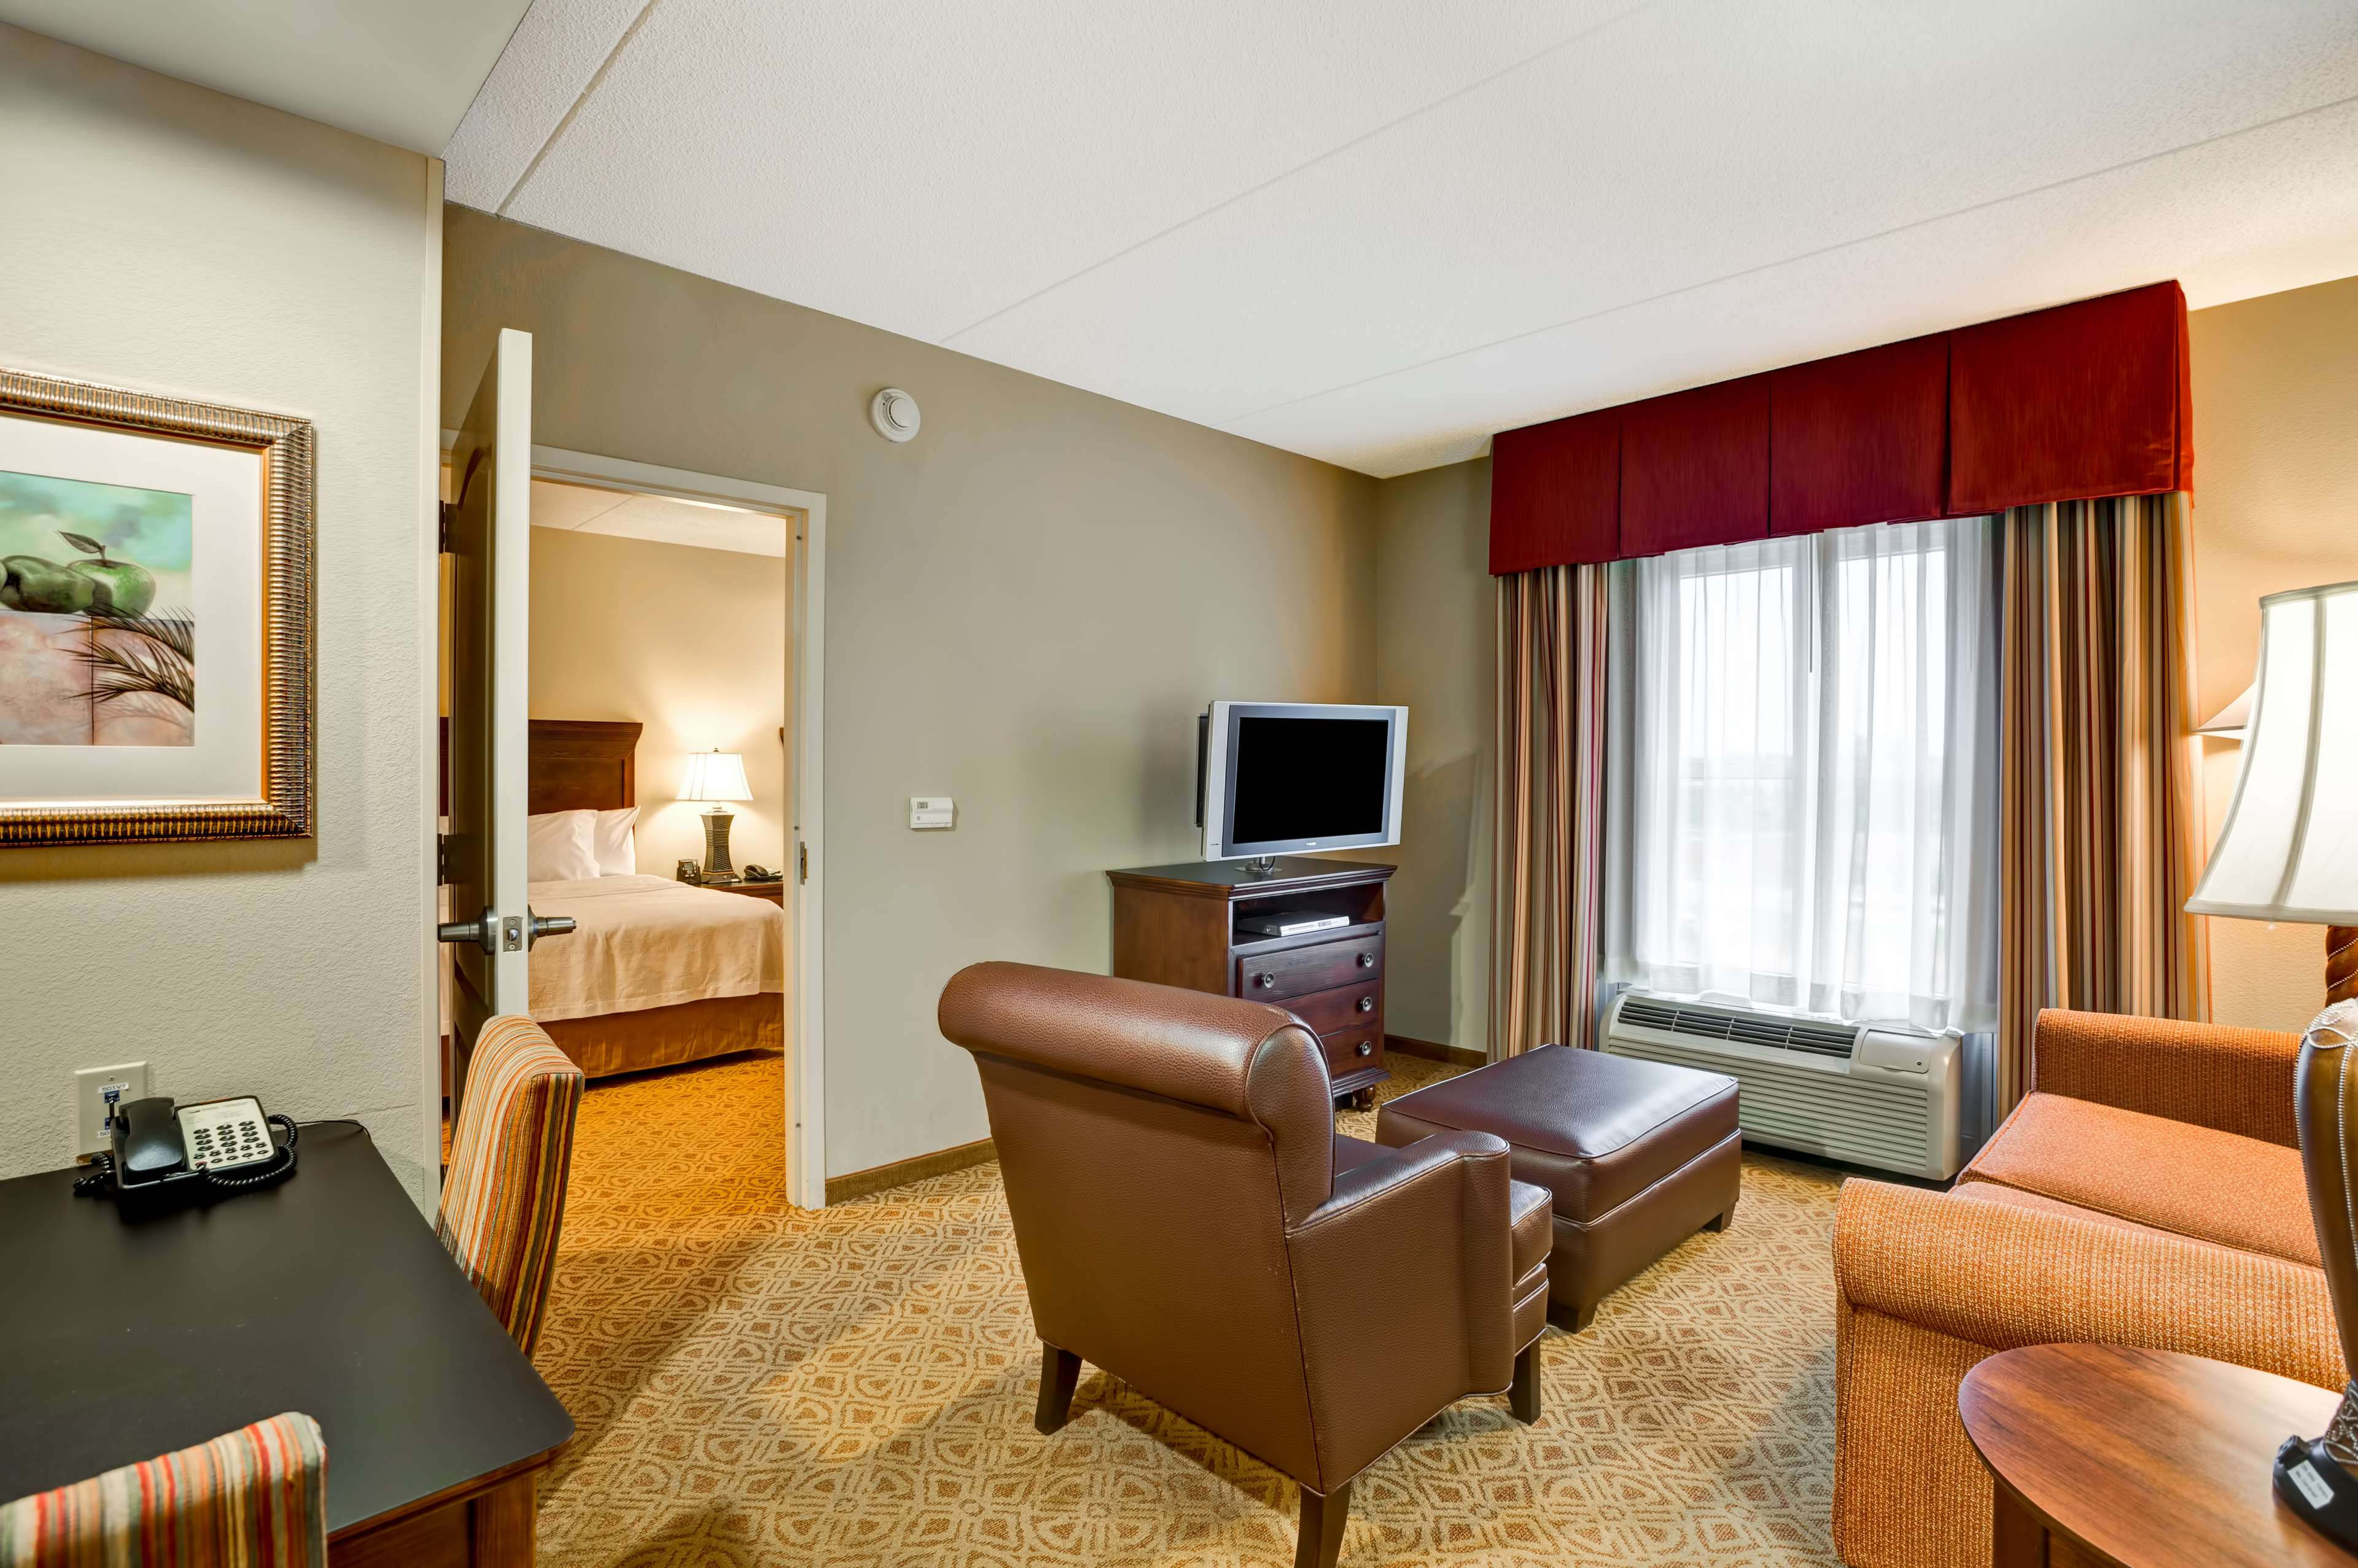 Homewood Suites by Hilton Fredericksburg image 32